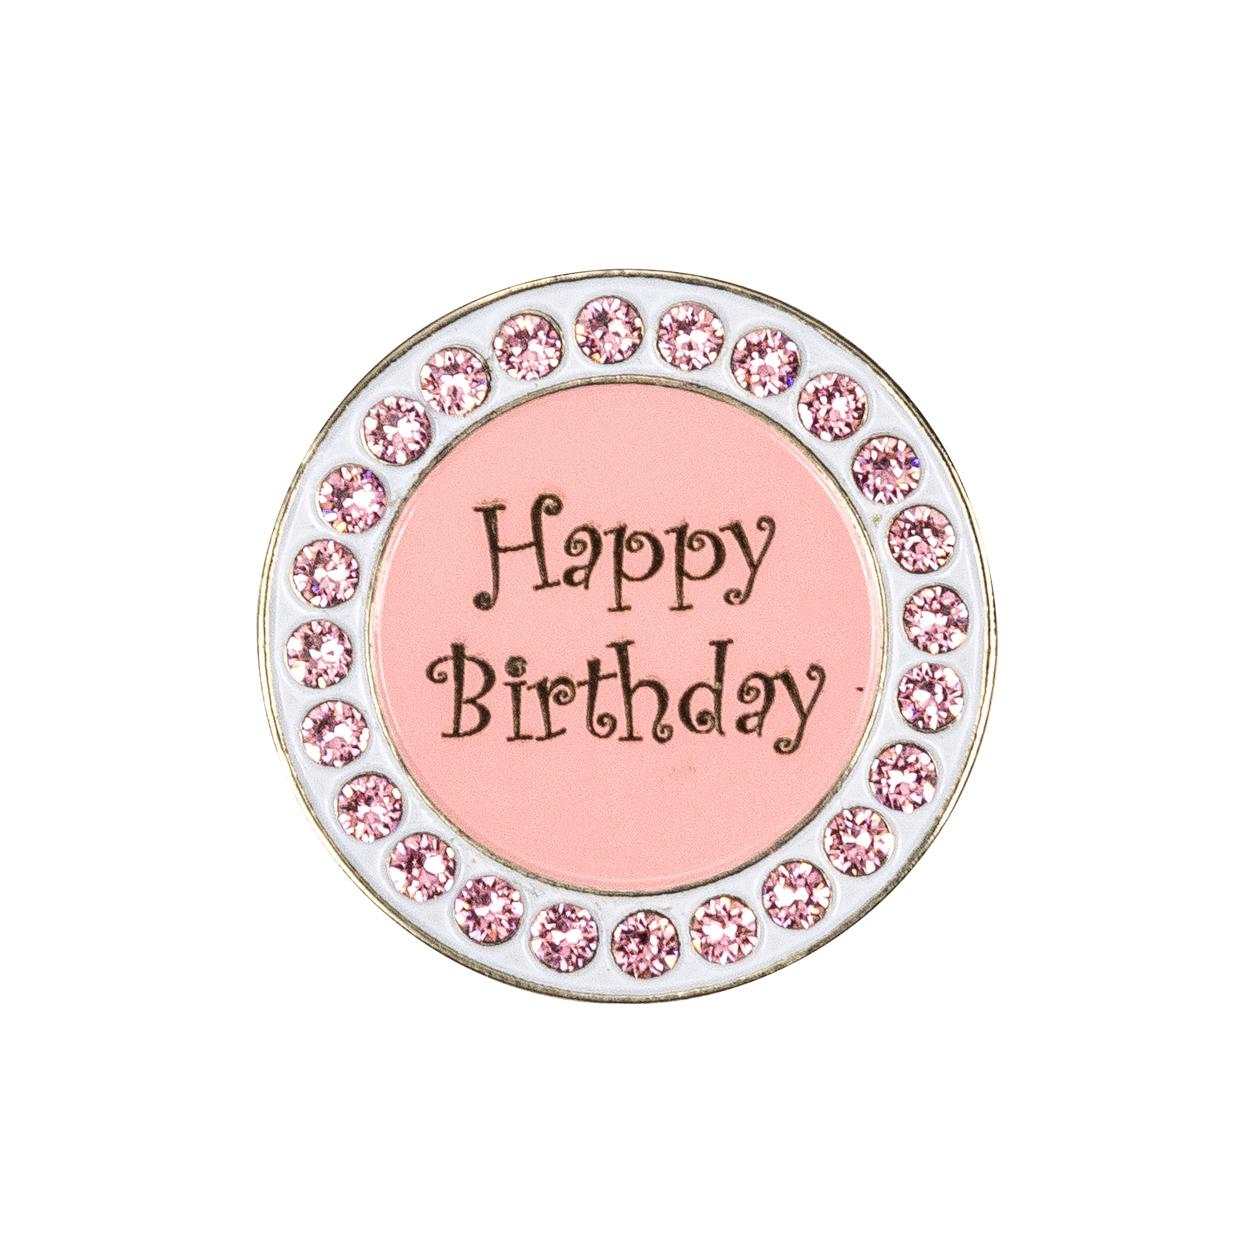 121. Happy Birthday